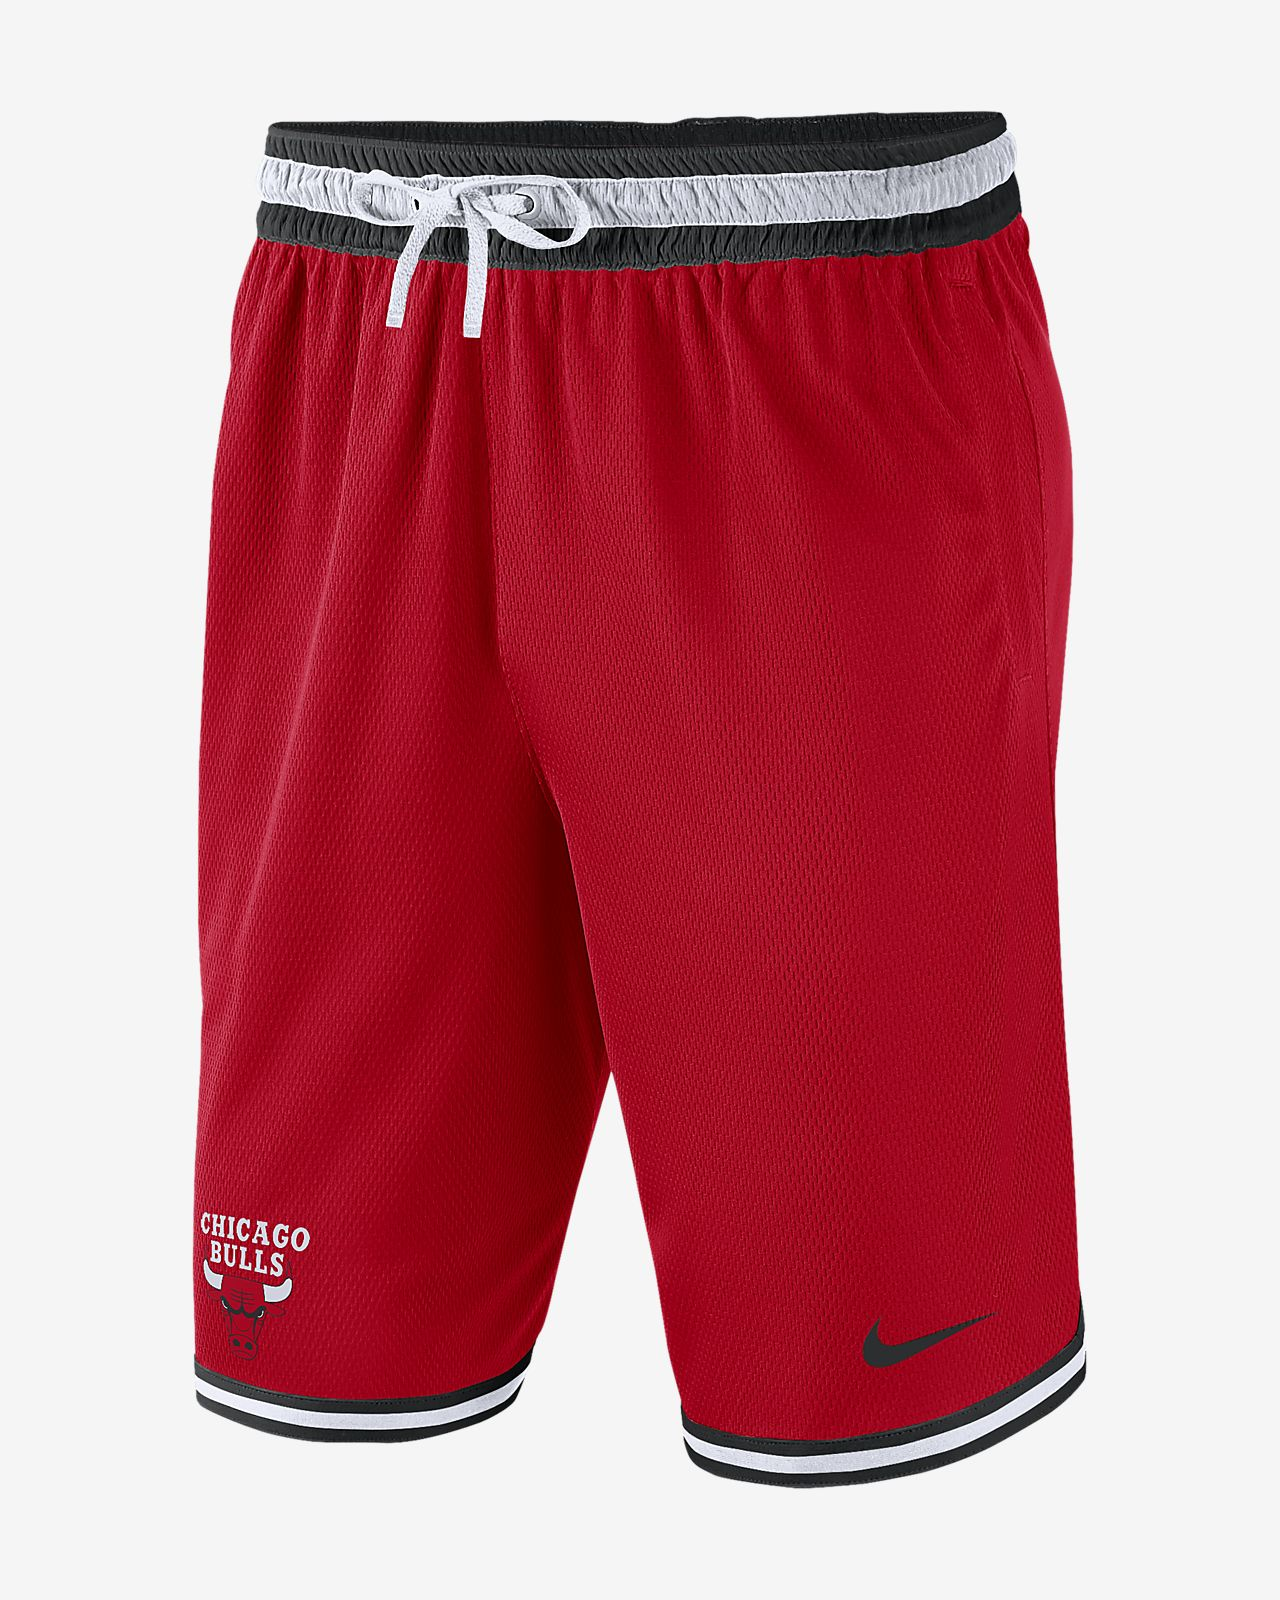 Chicago Bulls Nike Men's NBA Shorts